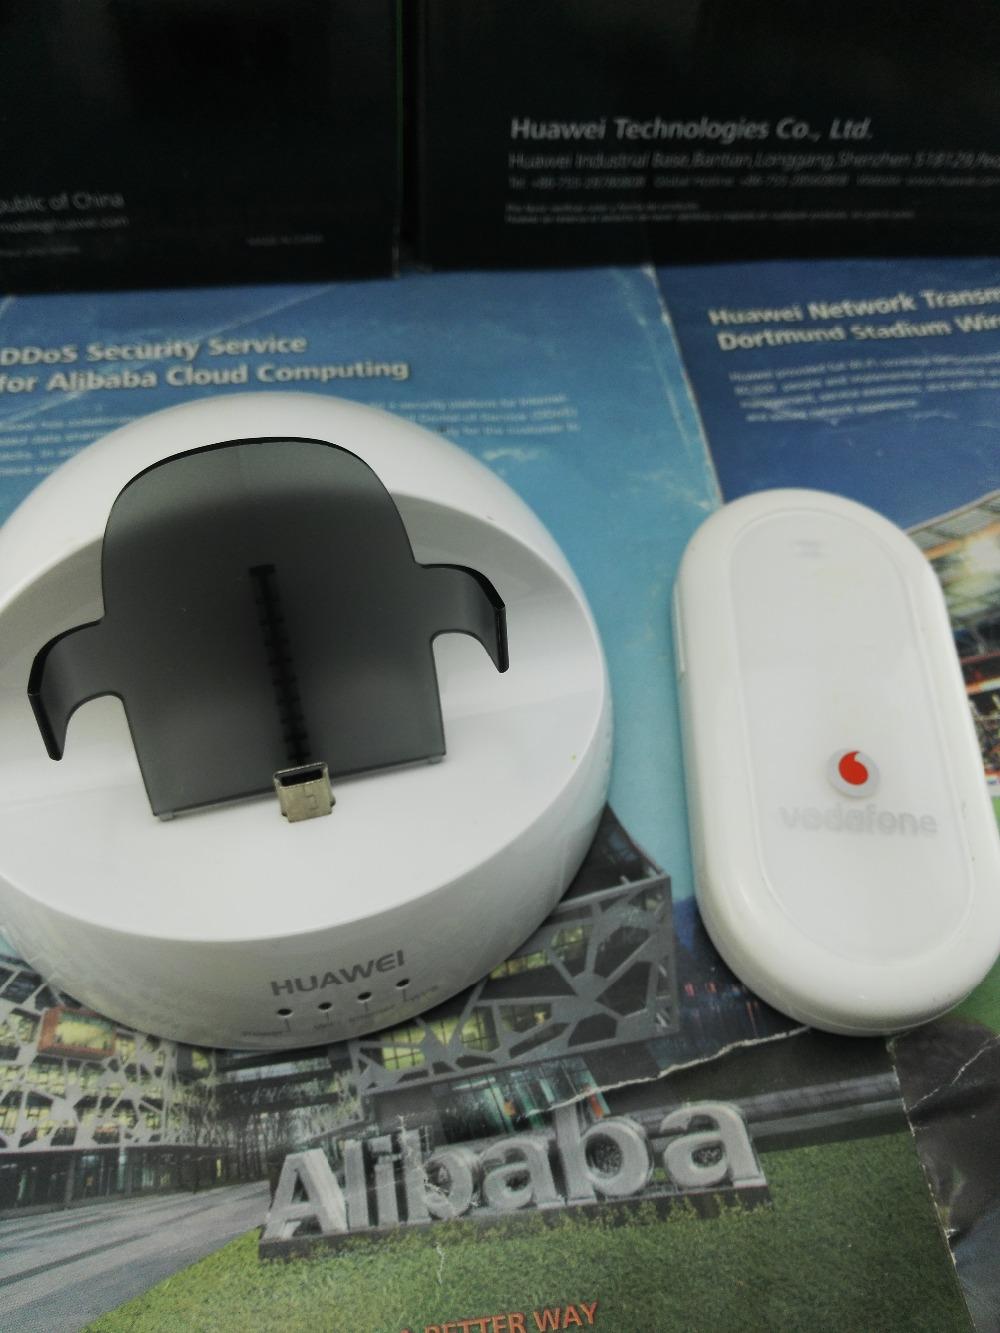 Huawei D108 Wireless Router Surf Station+HUAWEI E220,E216,E219 usb modem(choose one as you want)(China (Mainland))